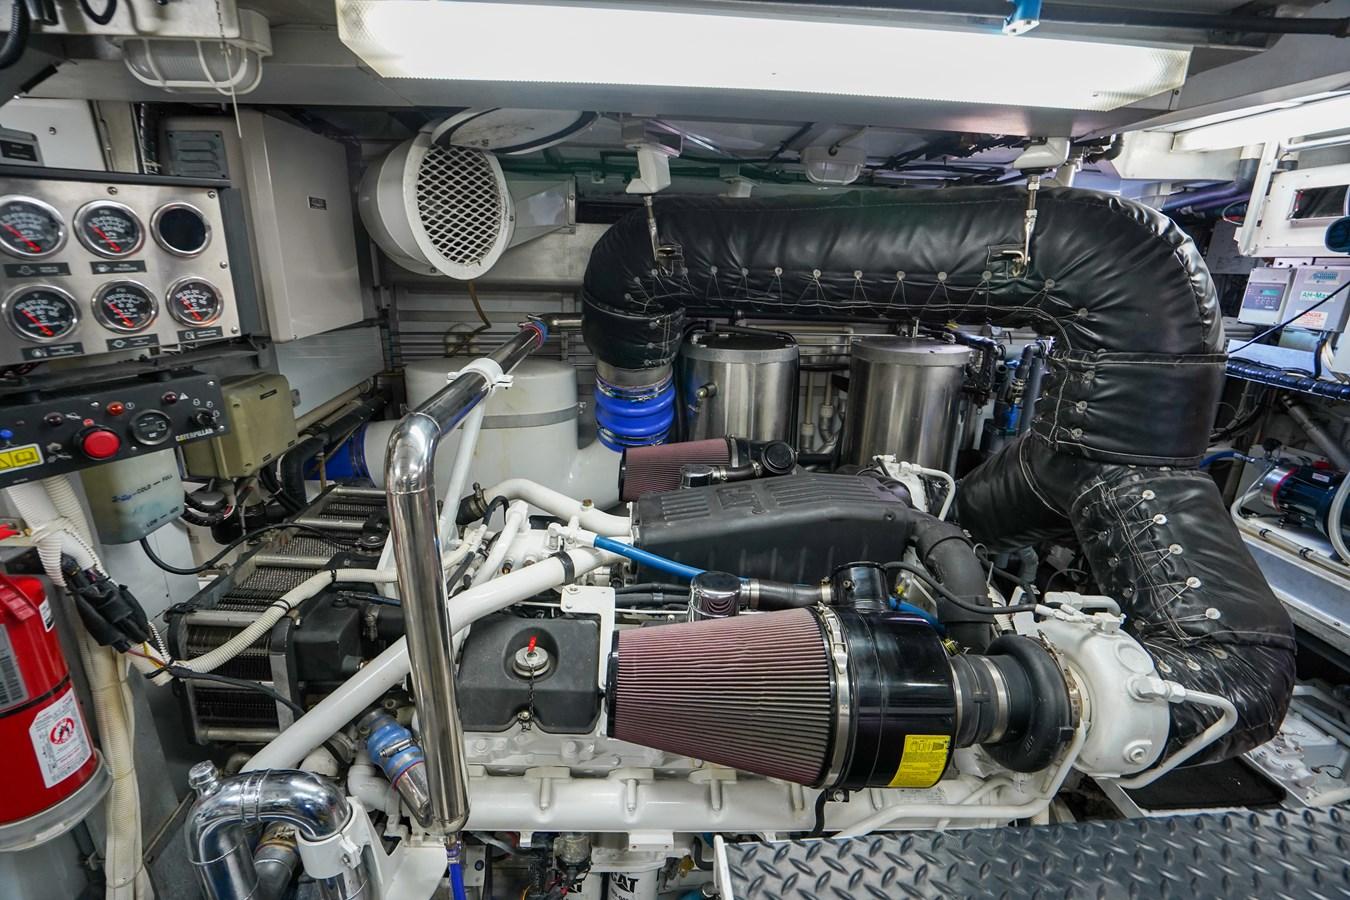 2011 85 Burger - Engine Room (1) 2001 BURGER 85 Motor Yacht Motor Yacht 2847202